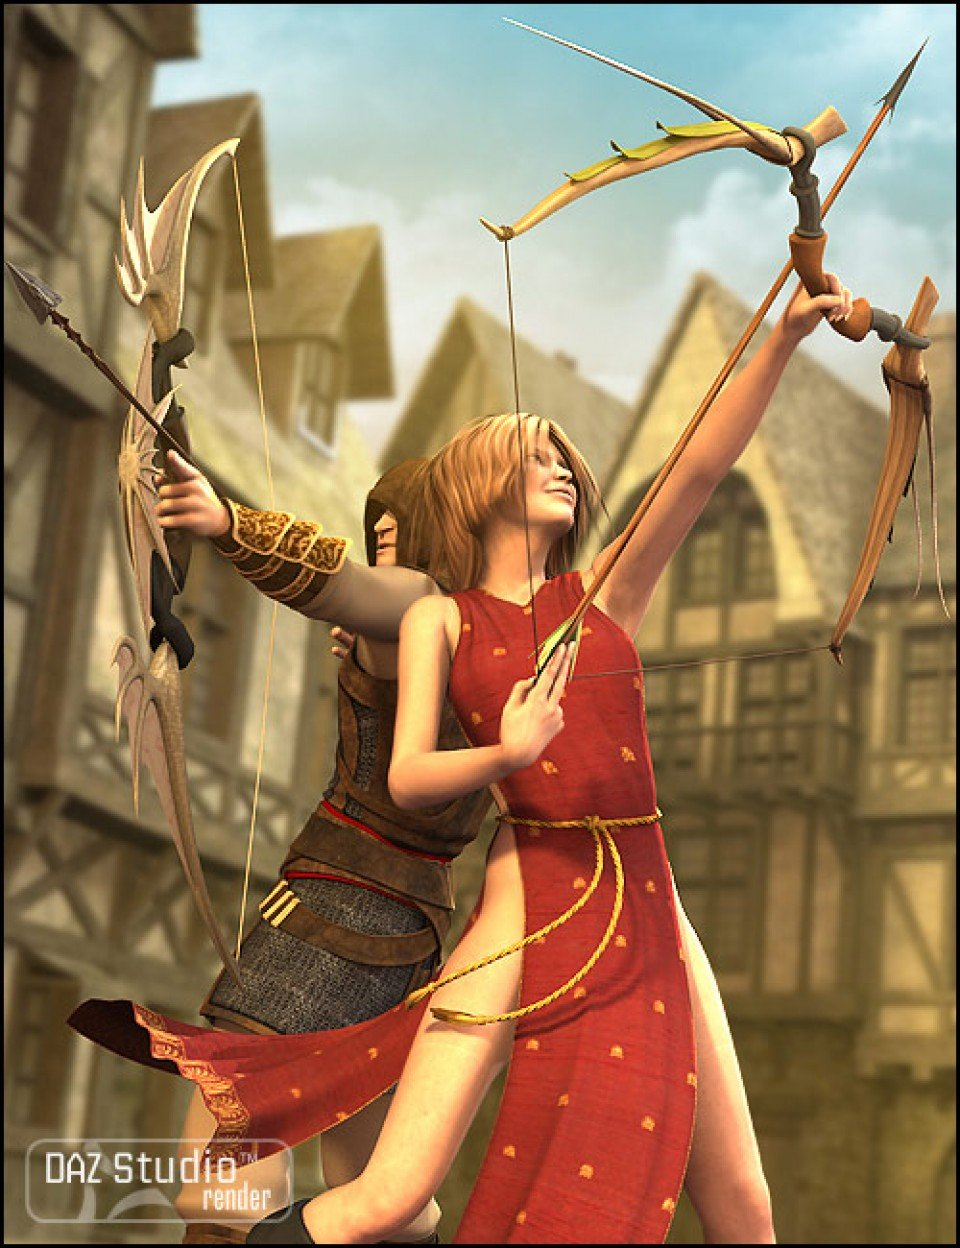 Arcane Archery_DAZ3D下载站